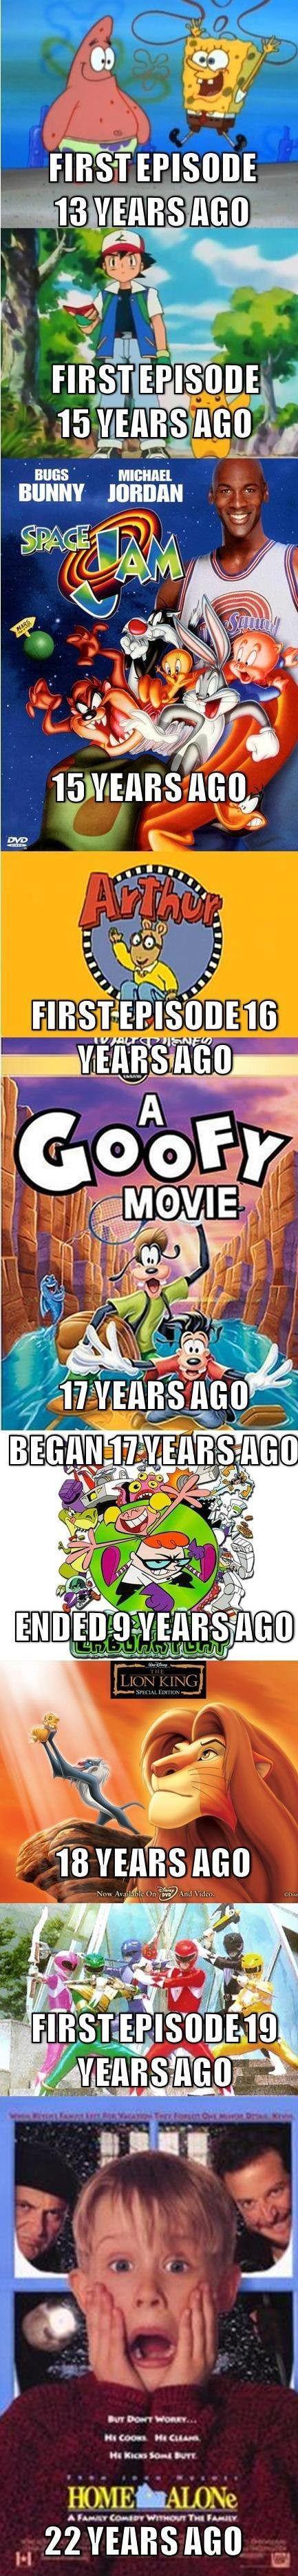 wow do I feel old!